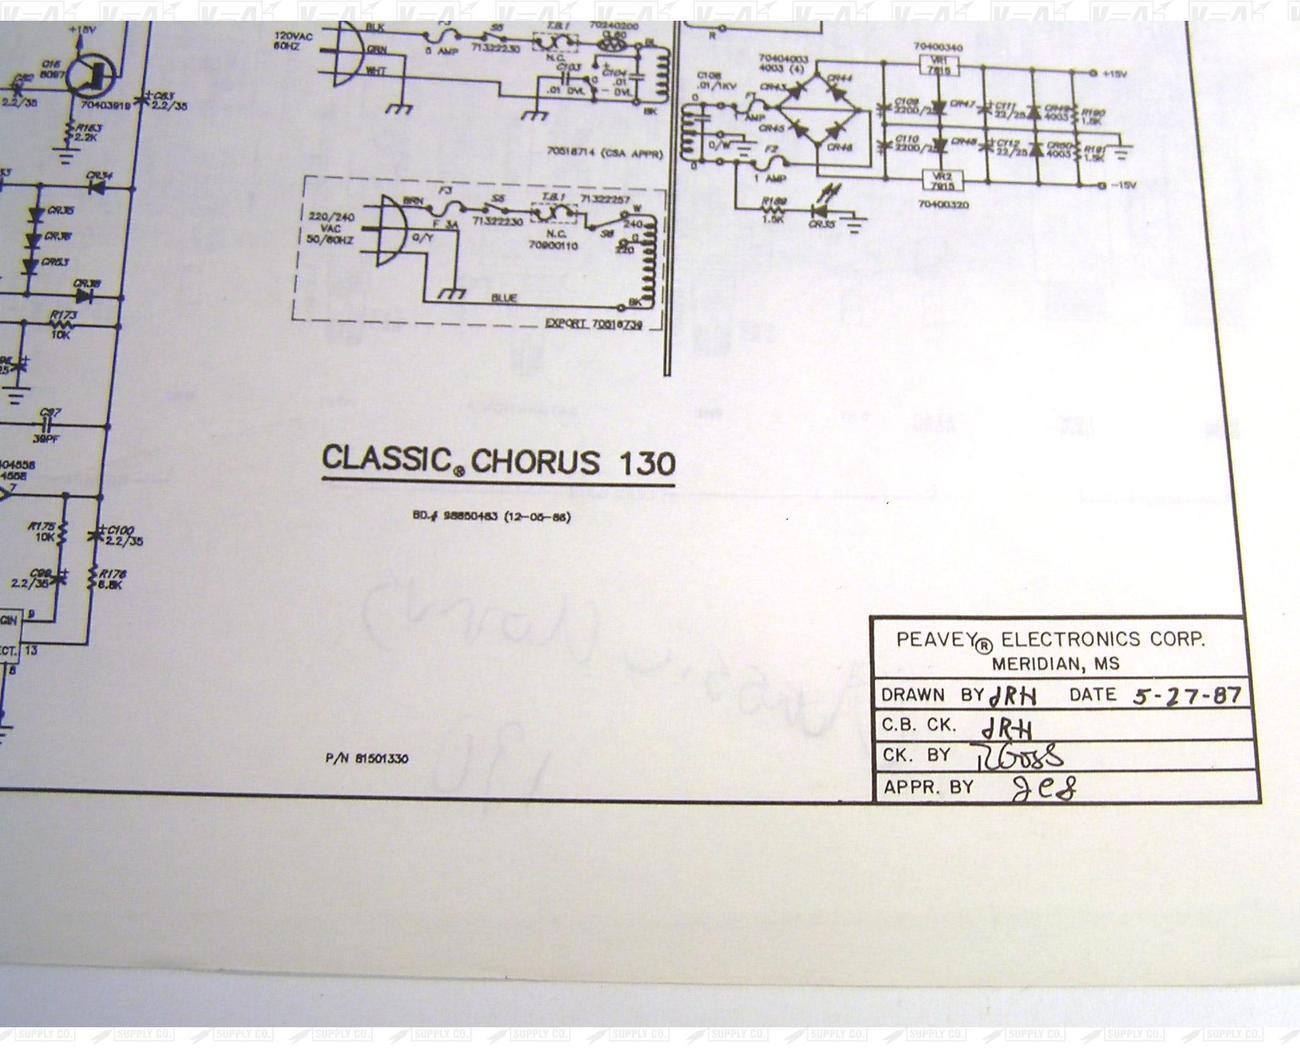 Peavey Classic Chorus 130 Amplifier Schematic And Diagram